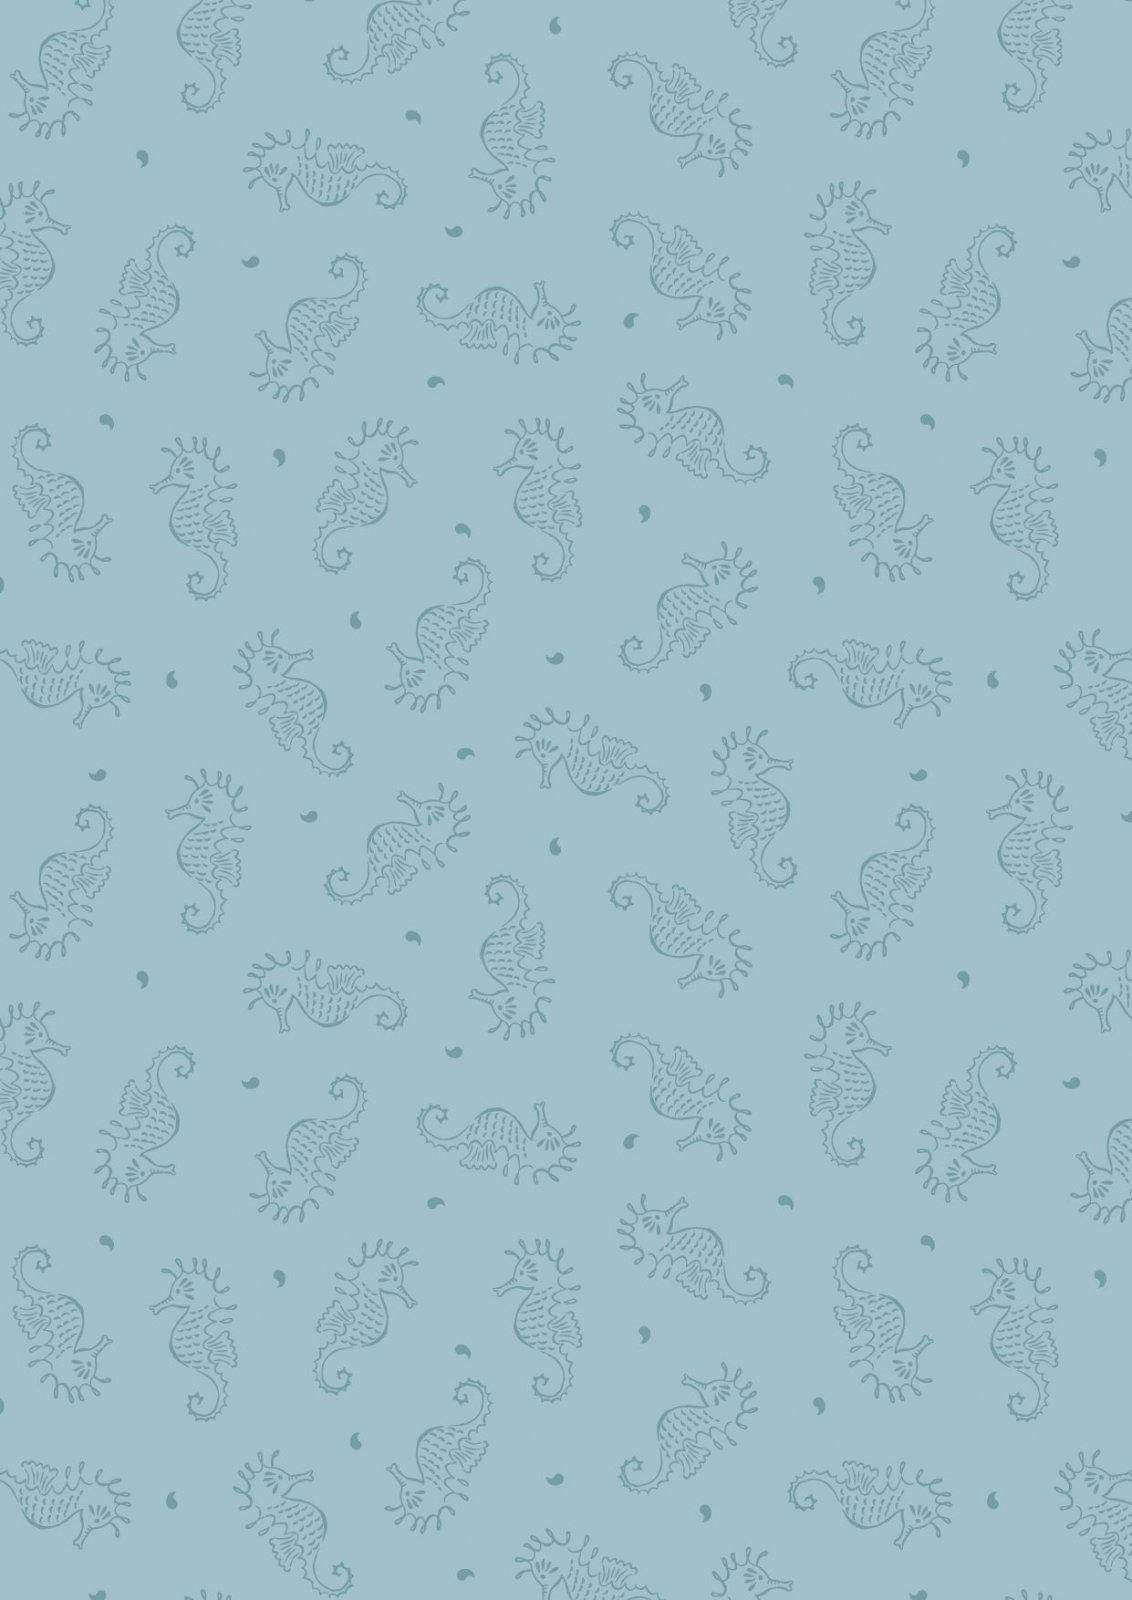 Thalassophile - Seahorses (Coastal Blue)